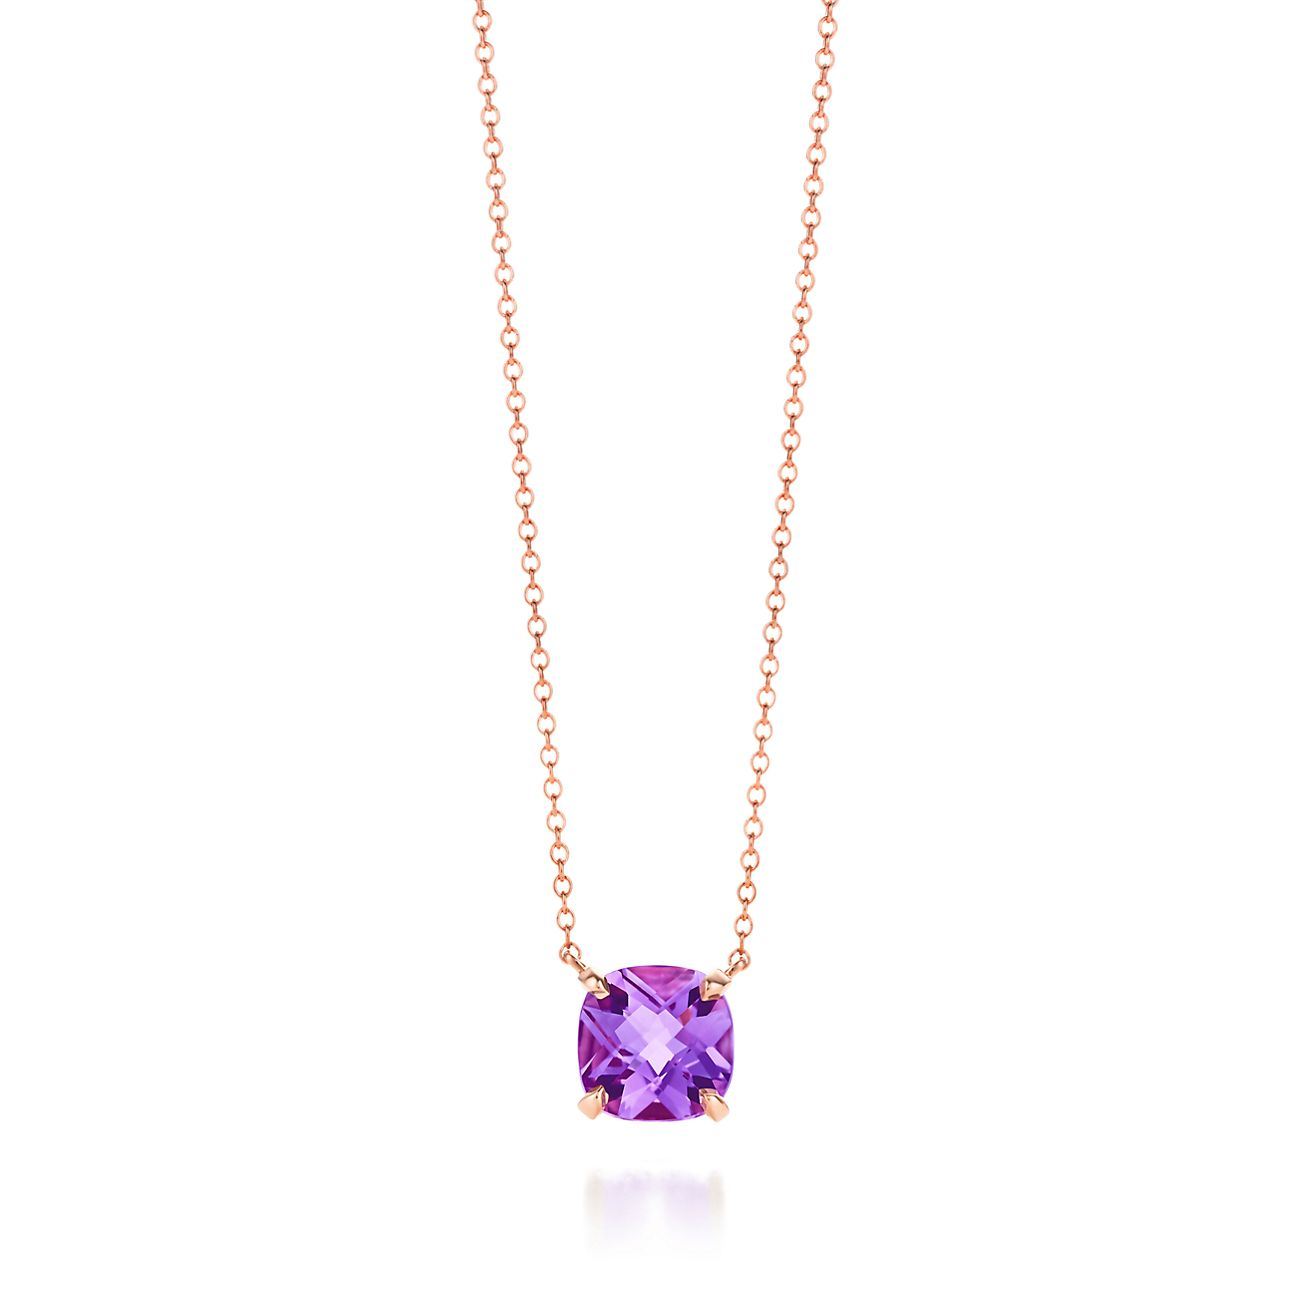 Tiffany Sparklers Lavender Amethyst Pendant